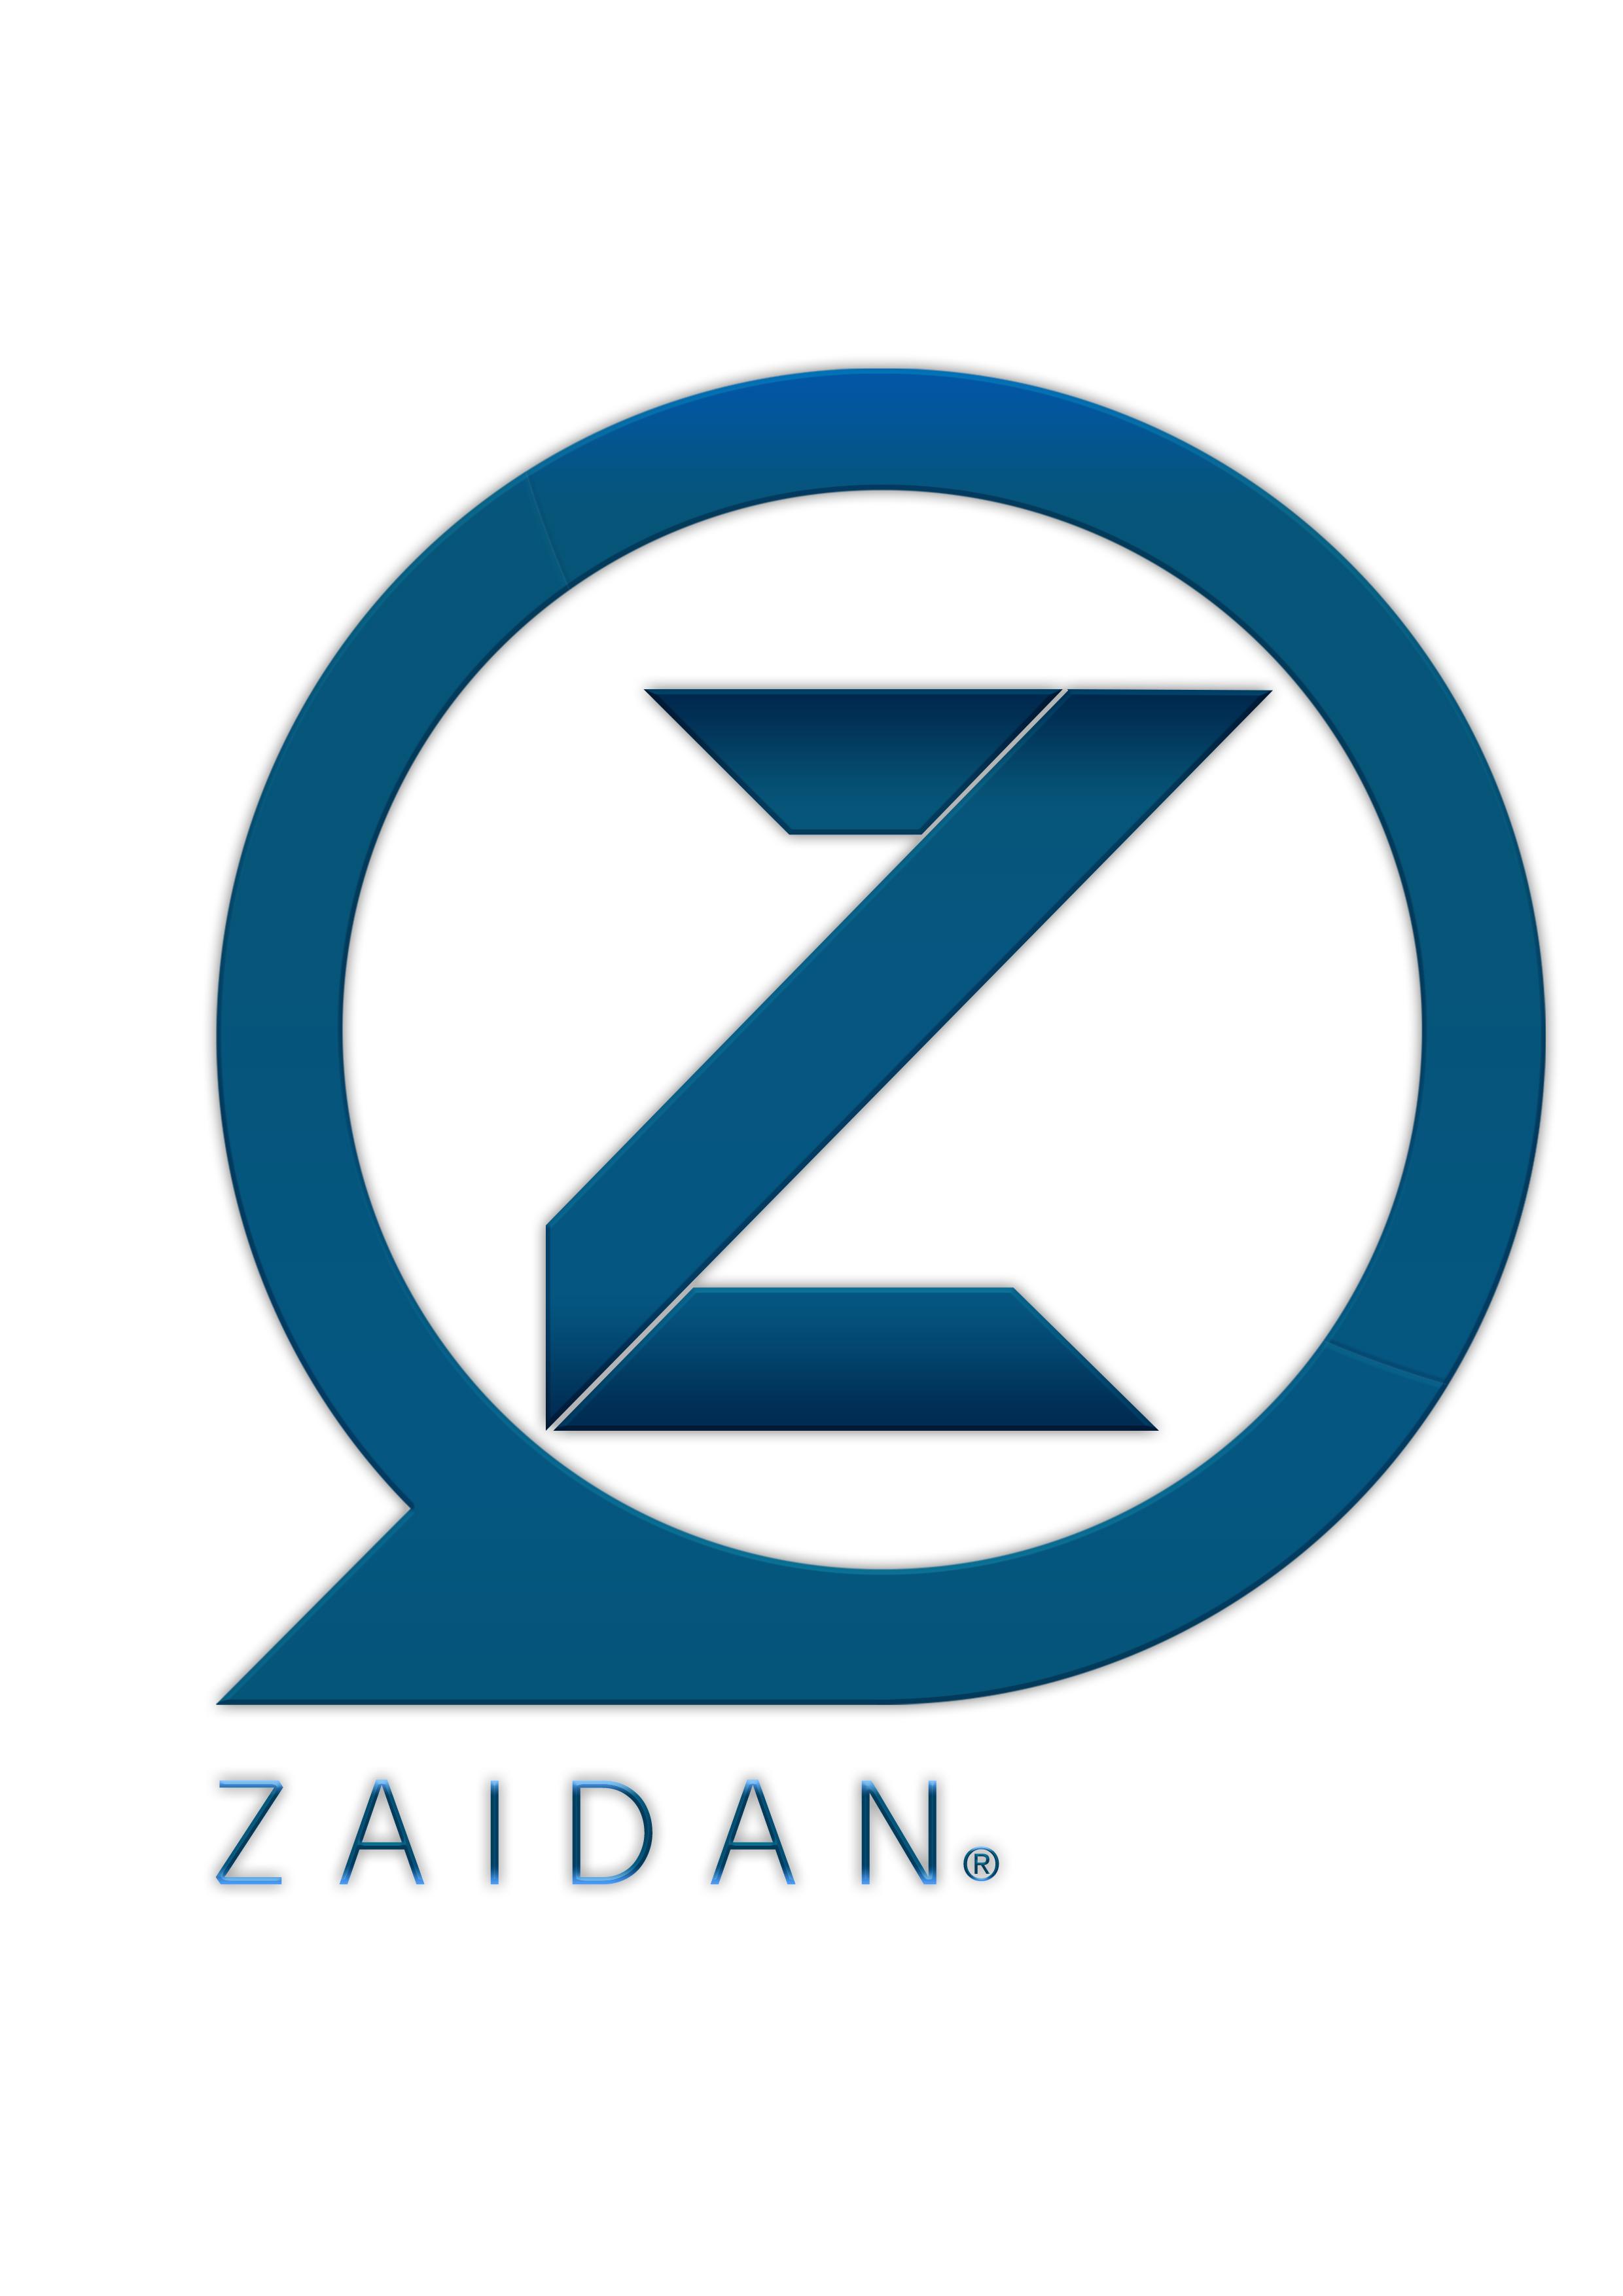 Zaidan 2010 s.l